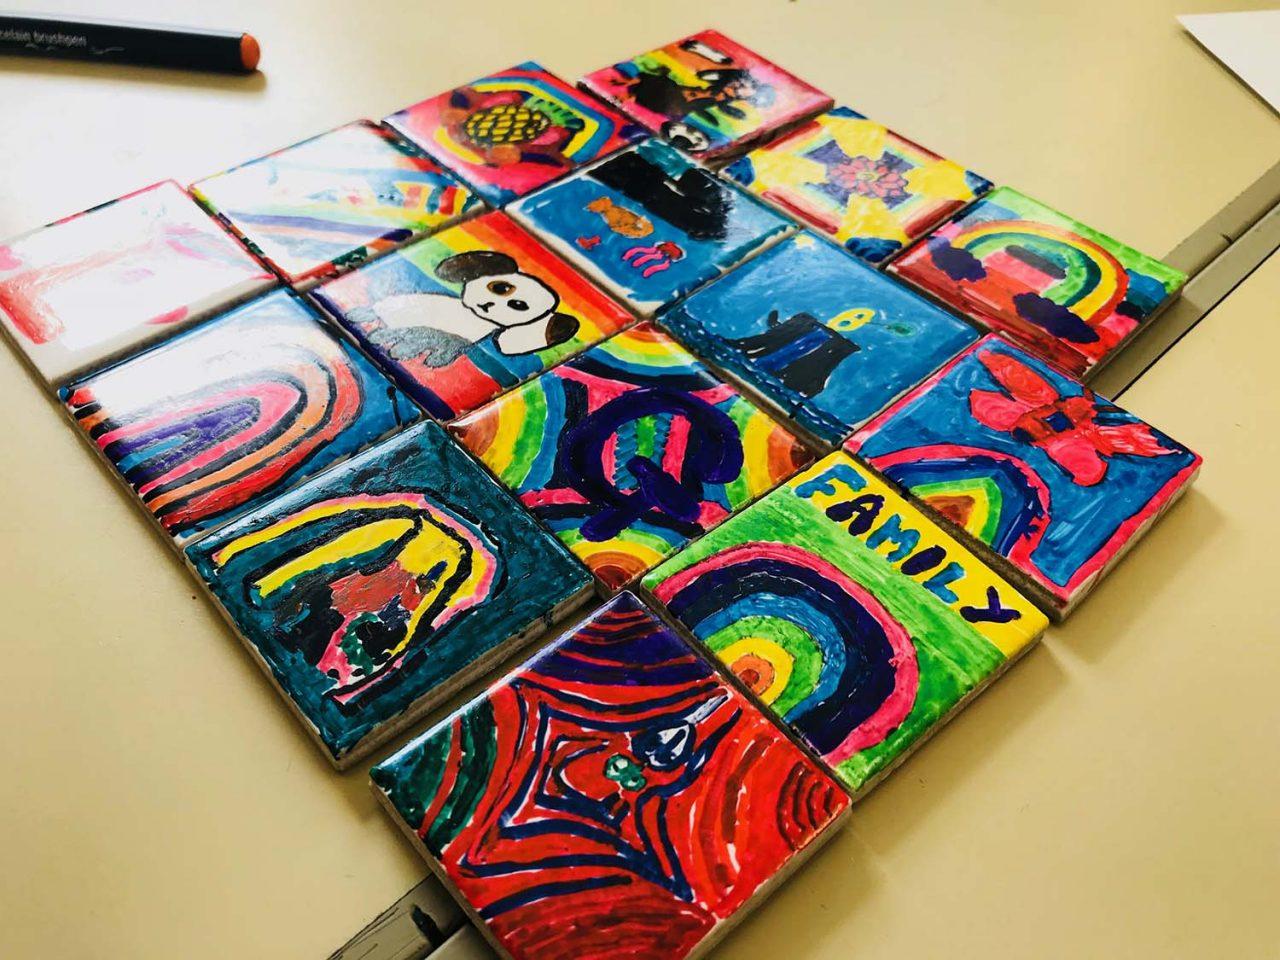 Fridge-Magnets-at-Indigo-arts-and-crafts-1280x960.jpg